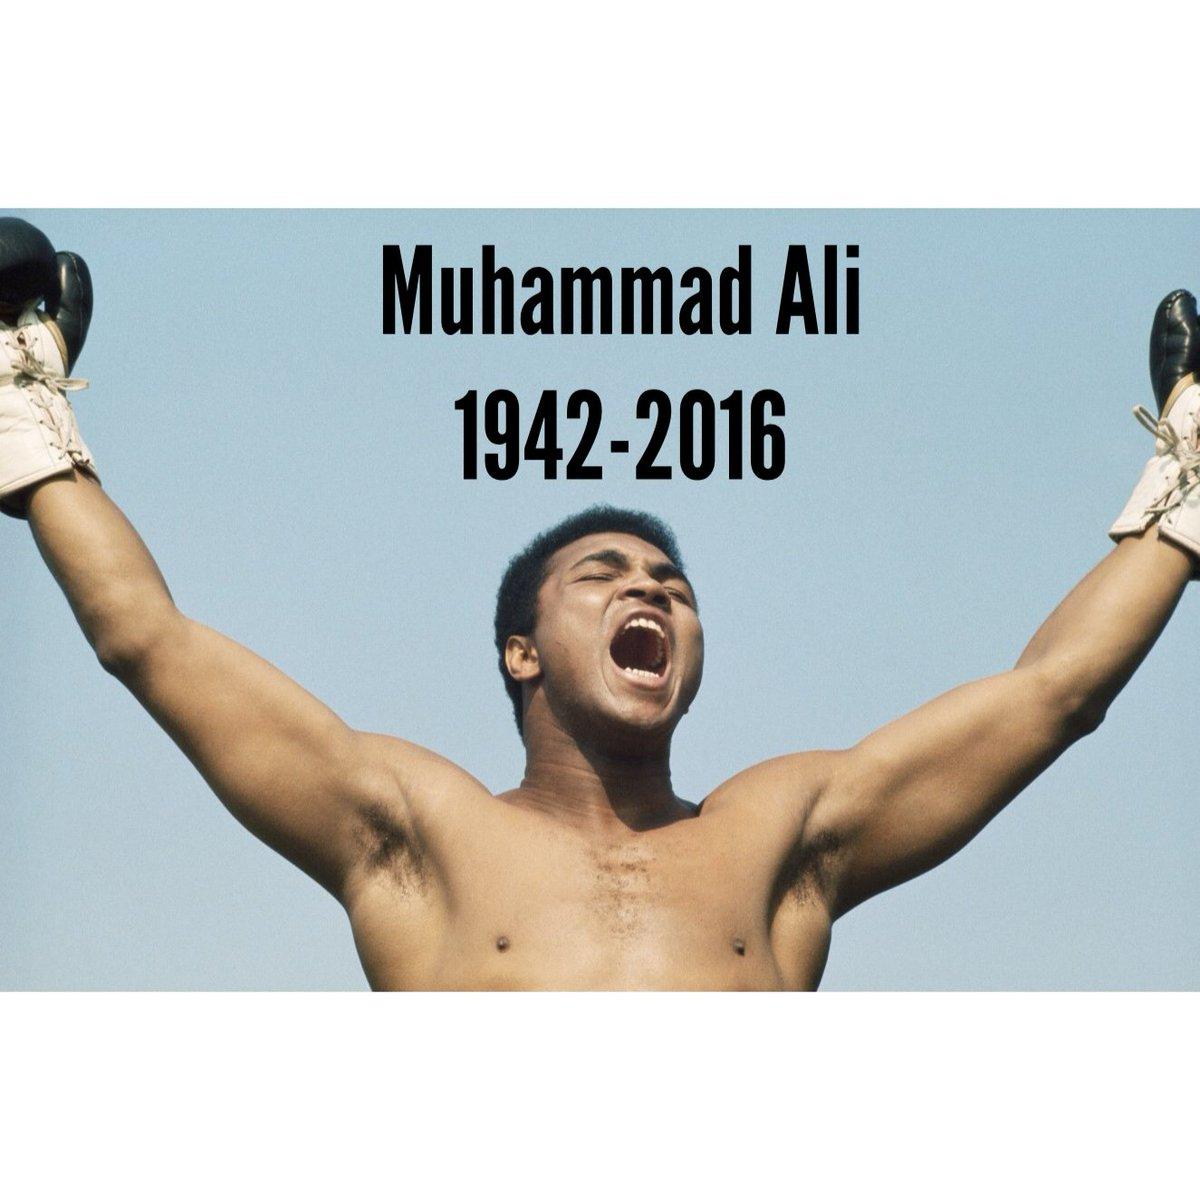 A legend has left us. #RIPMuhammadAli https://t.co/byUtNWRPQl